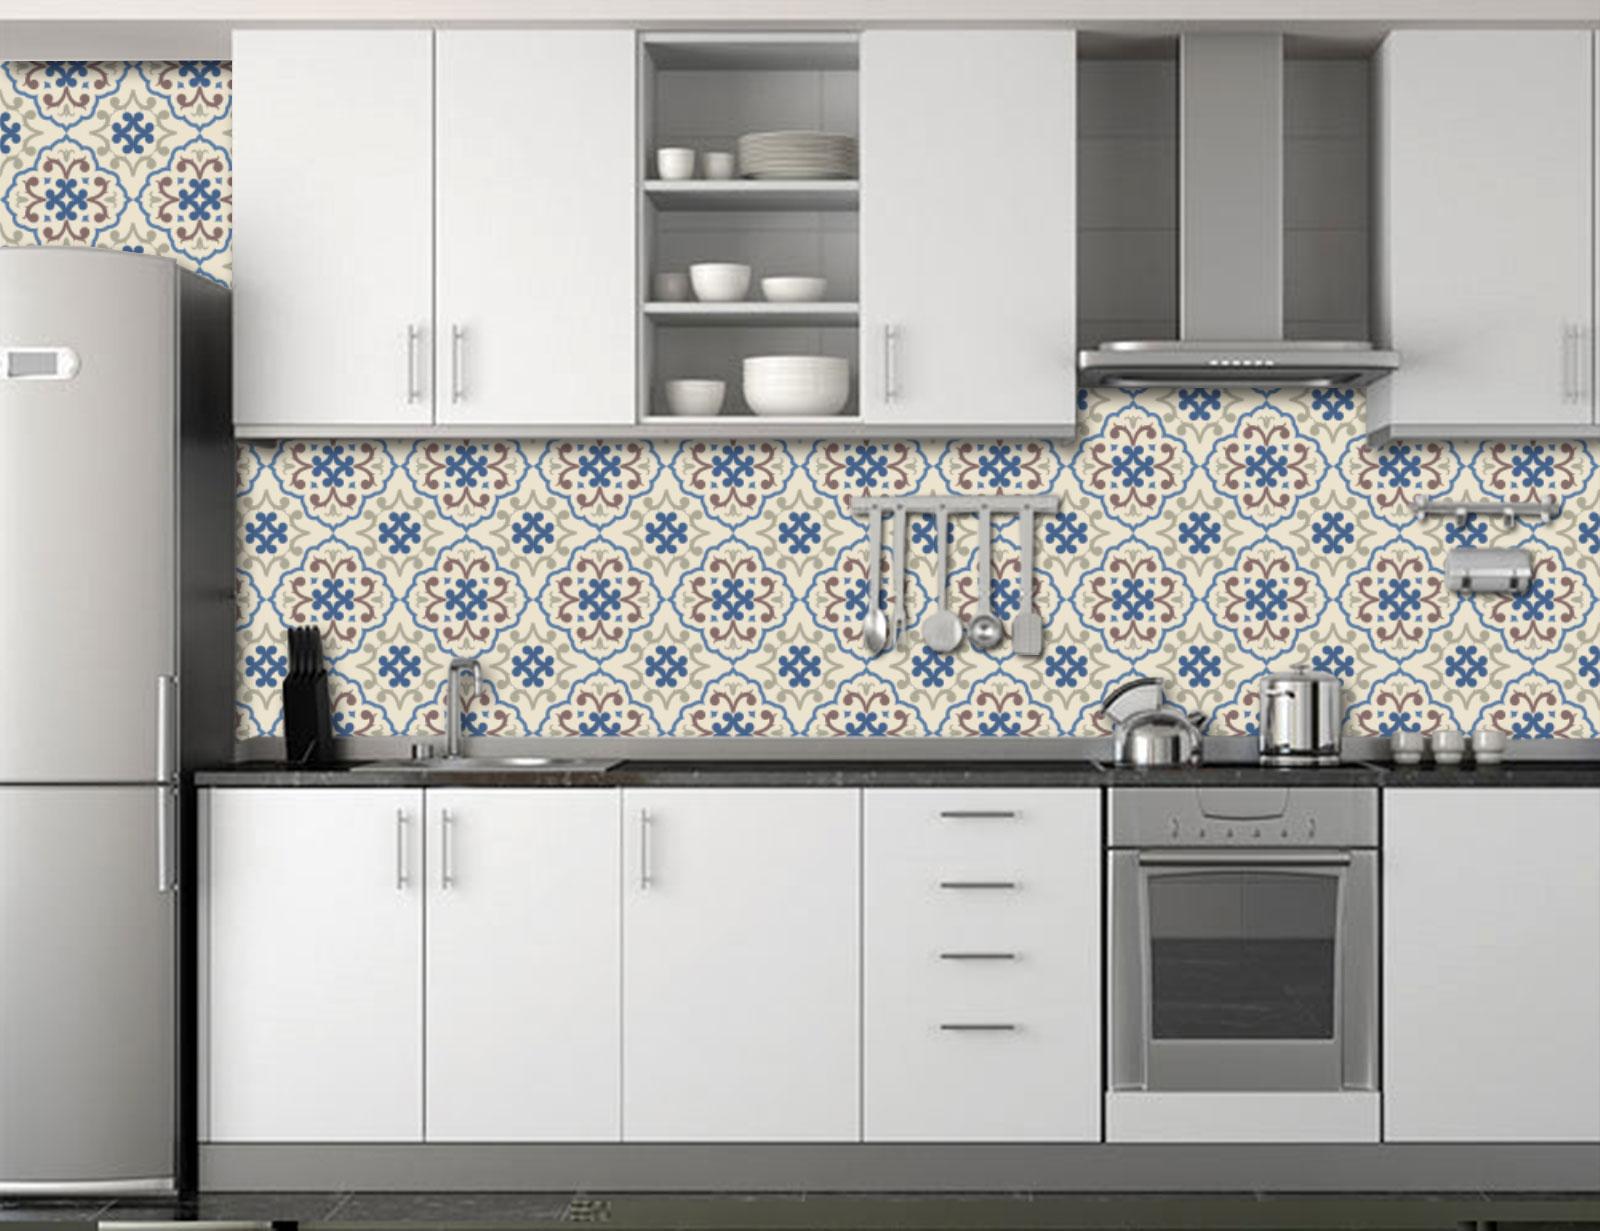 2b61db0f2 Adesivo Parede Cozinha Azulejo